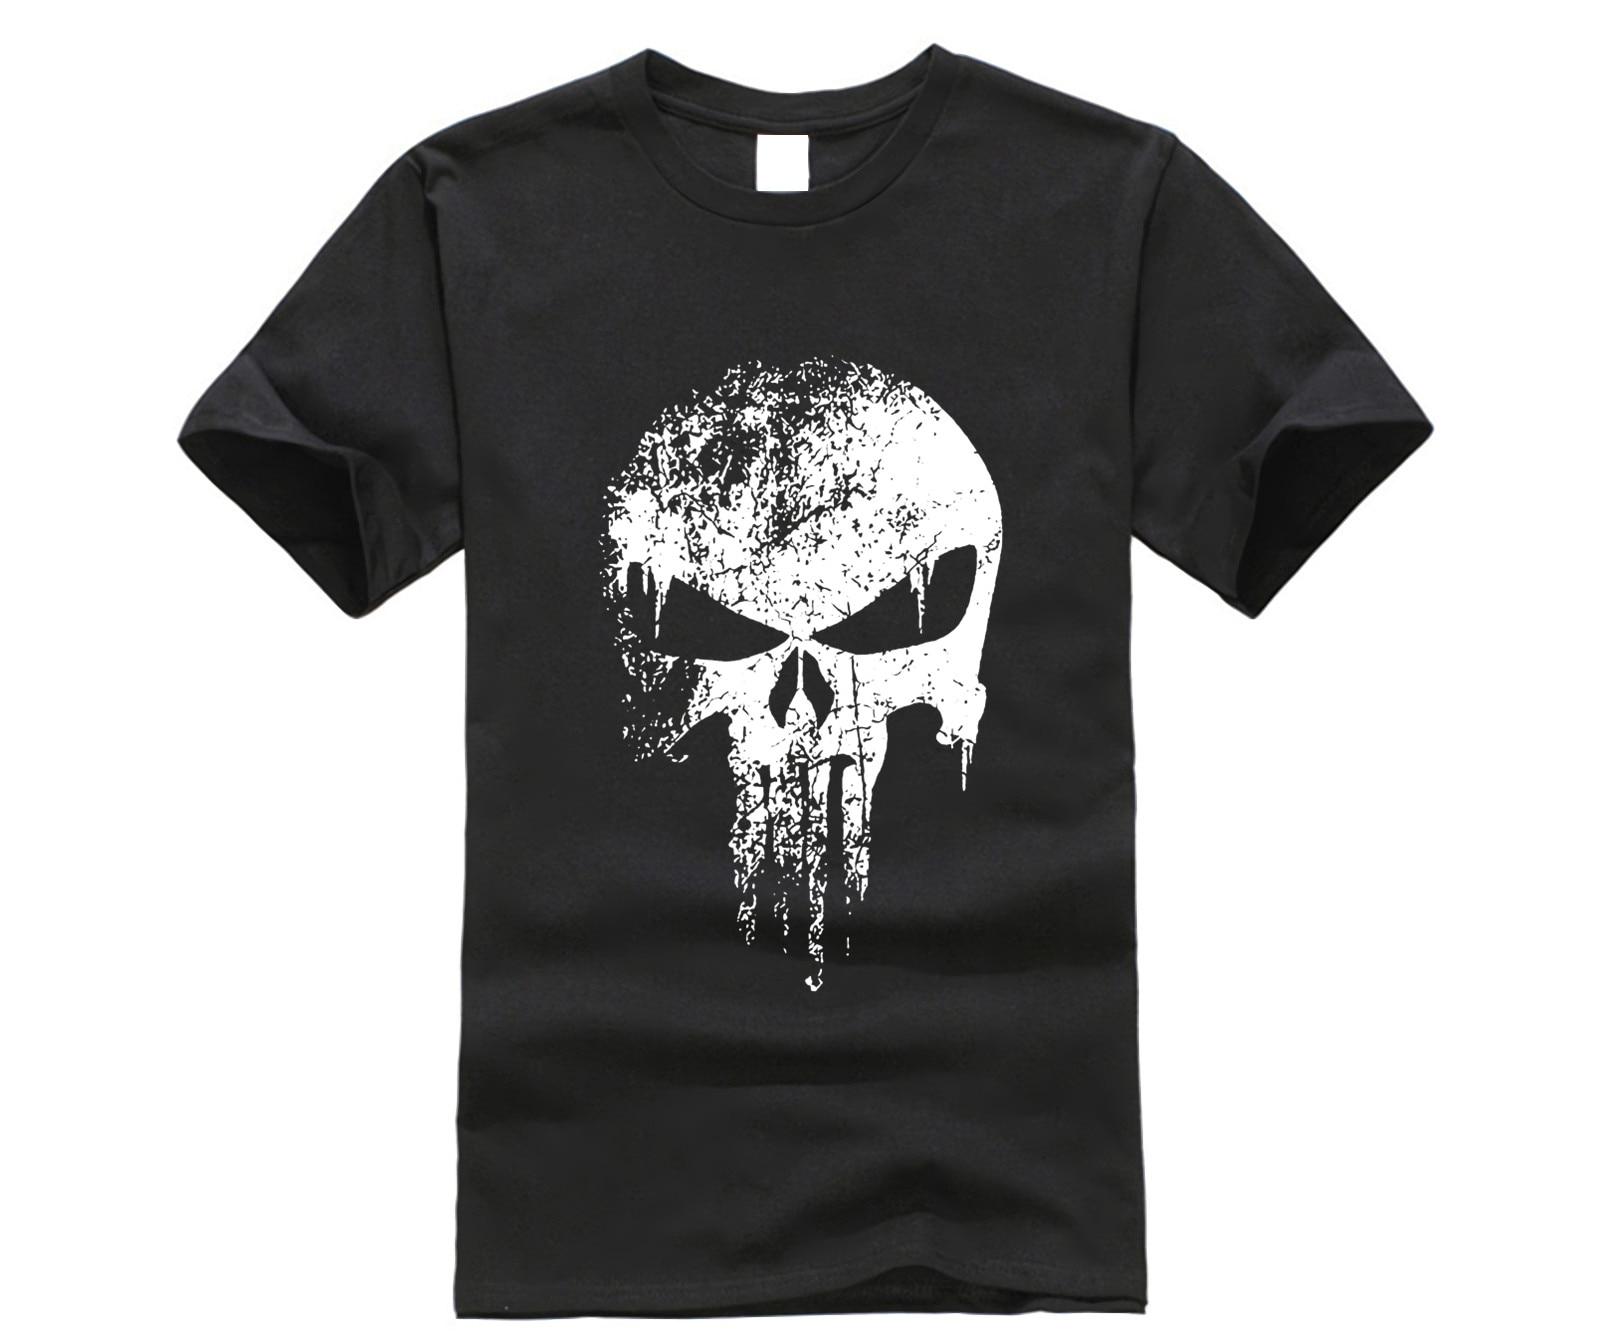 T-shirts Cooperative Punisher Skull Vintage T Shirt Digital Printing Superhero Streatwear Men Mma Clothing 100% Cotton Short Sleeve T-shirt Plus Size